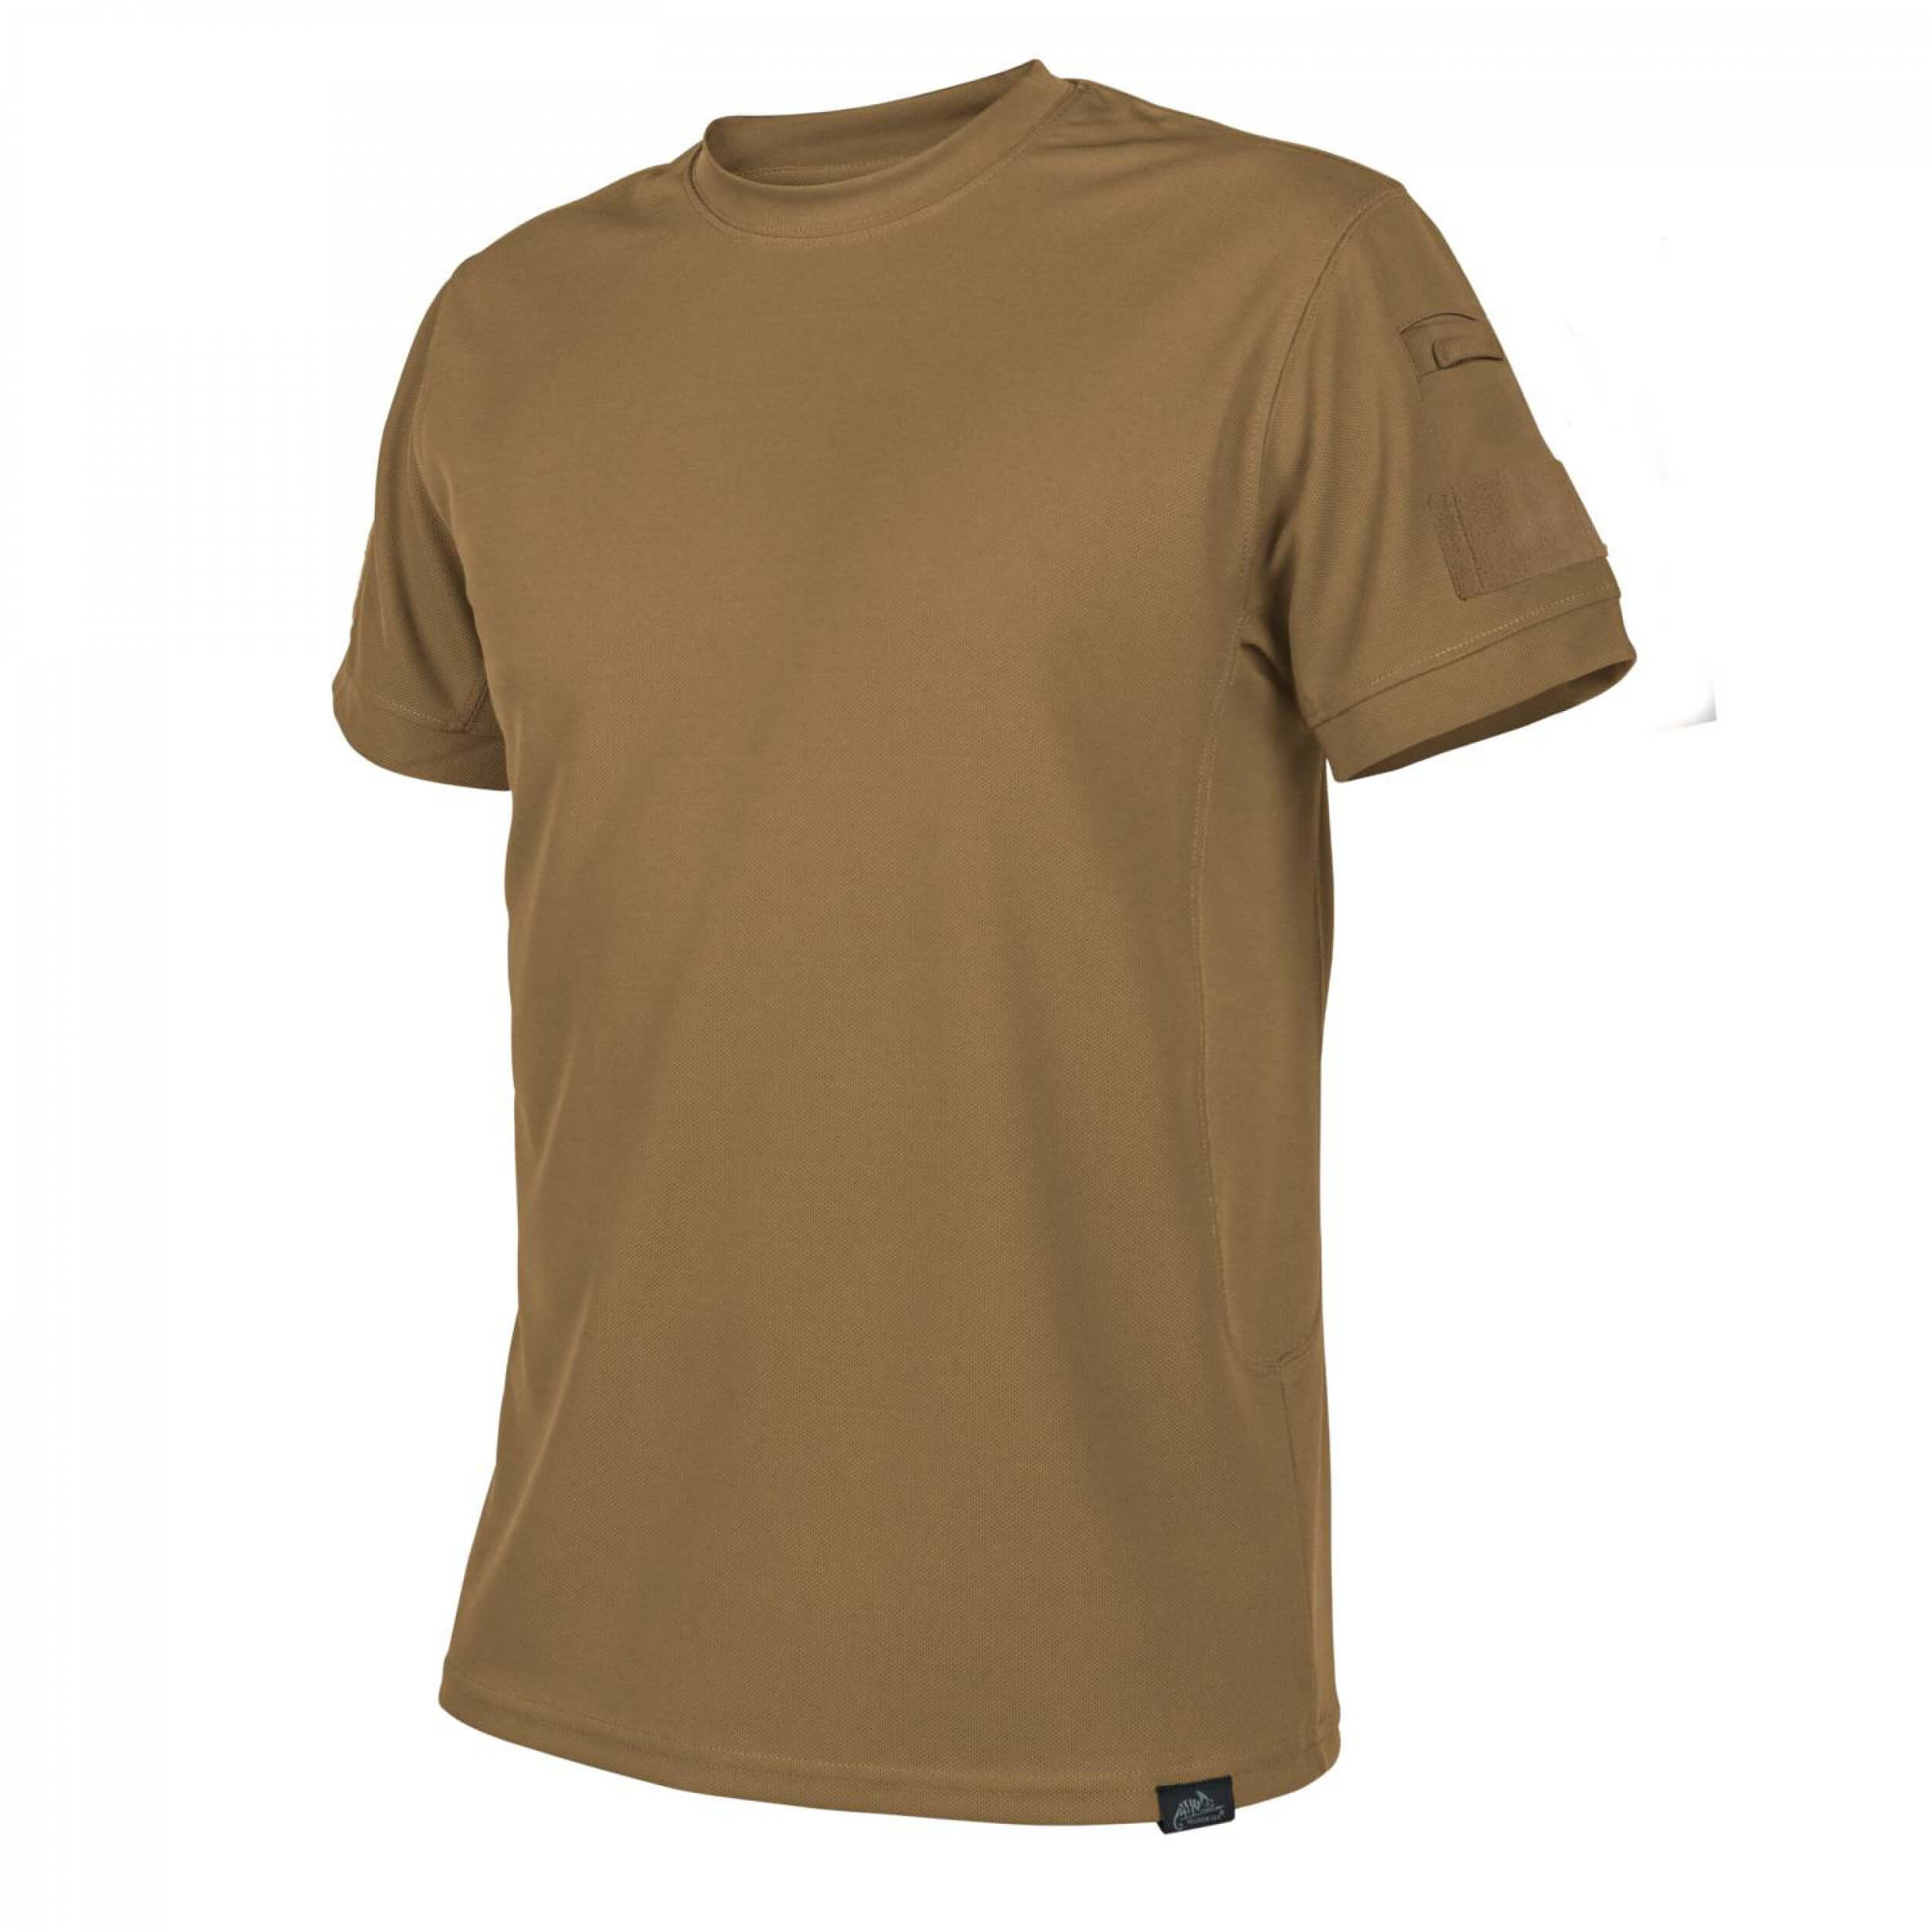 Helikon-Tex TACTICAL T-Shirt - TopCool Lite - Coyote